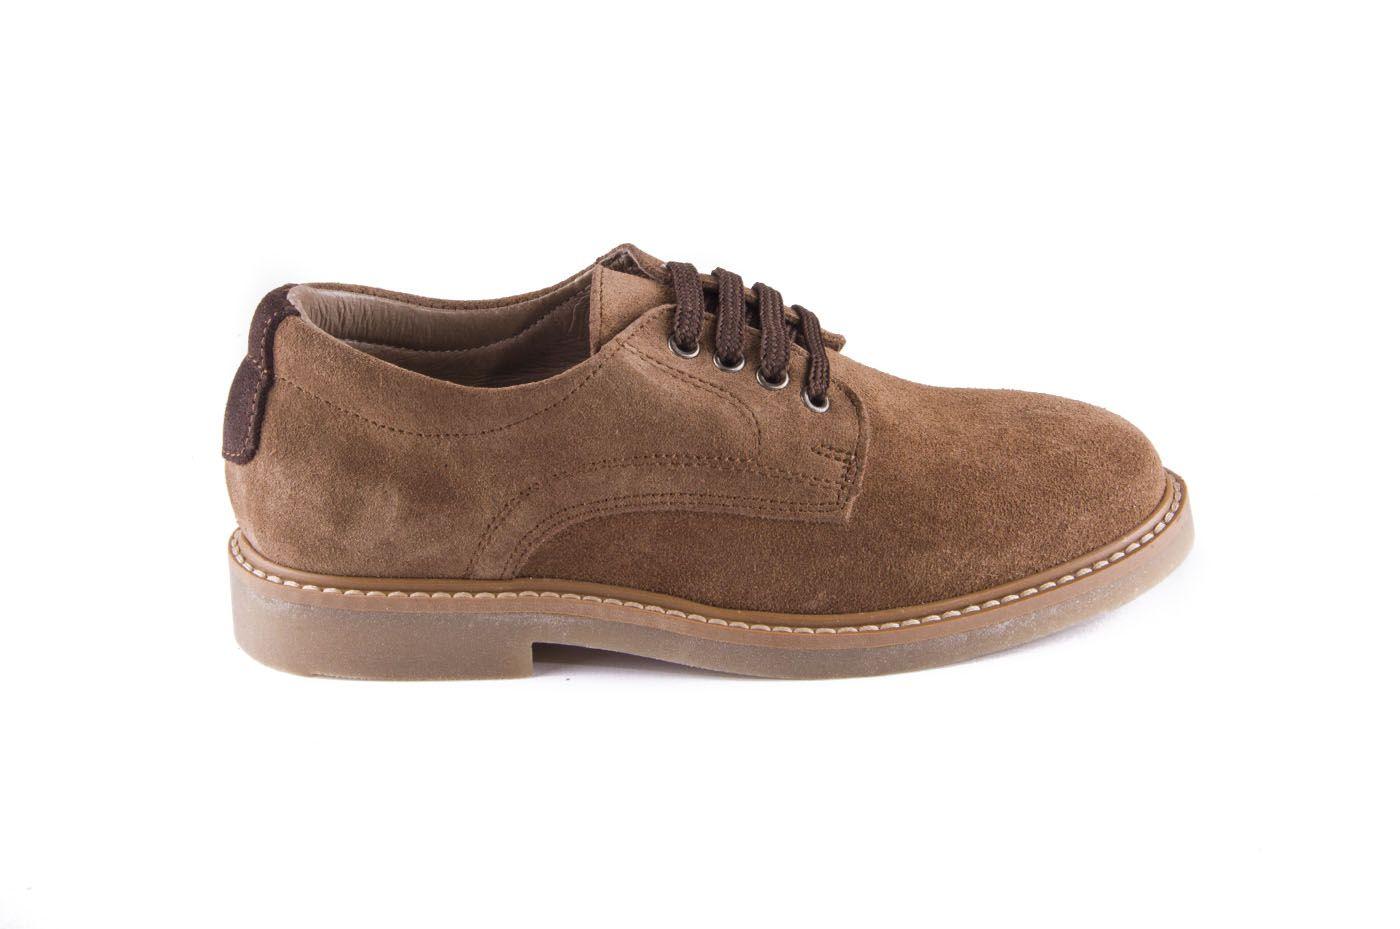 d80204eba98 Comprar zapato tipo JOVEN NIÑO estilo BLUCHER COLOR CAMEL PIEL ...